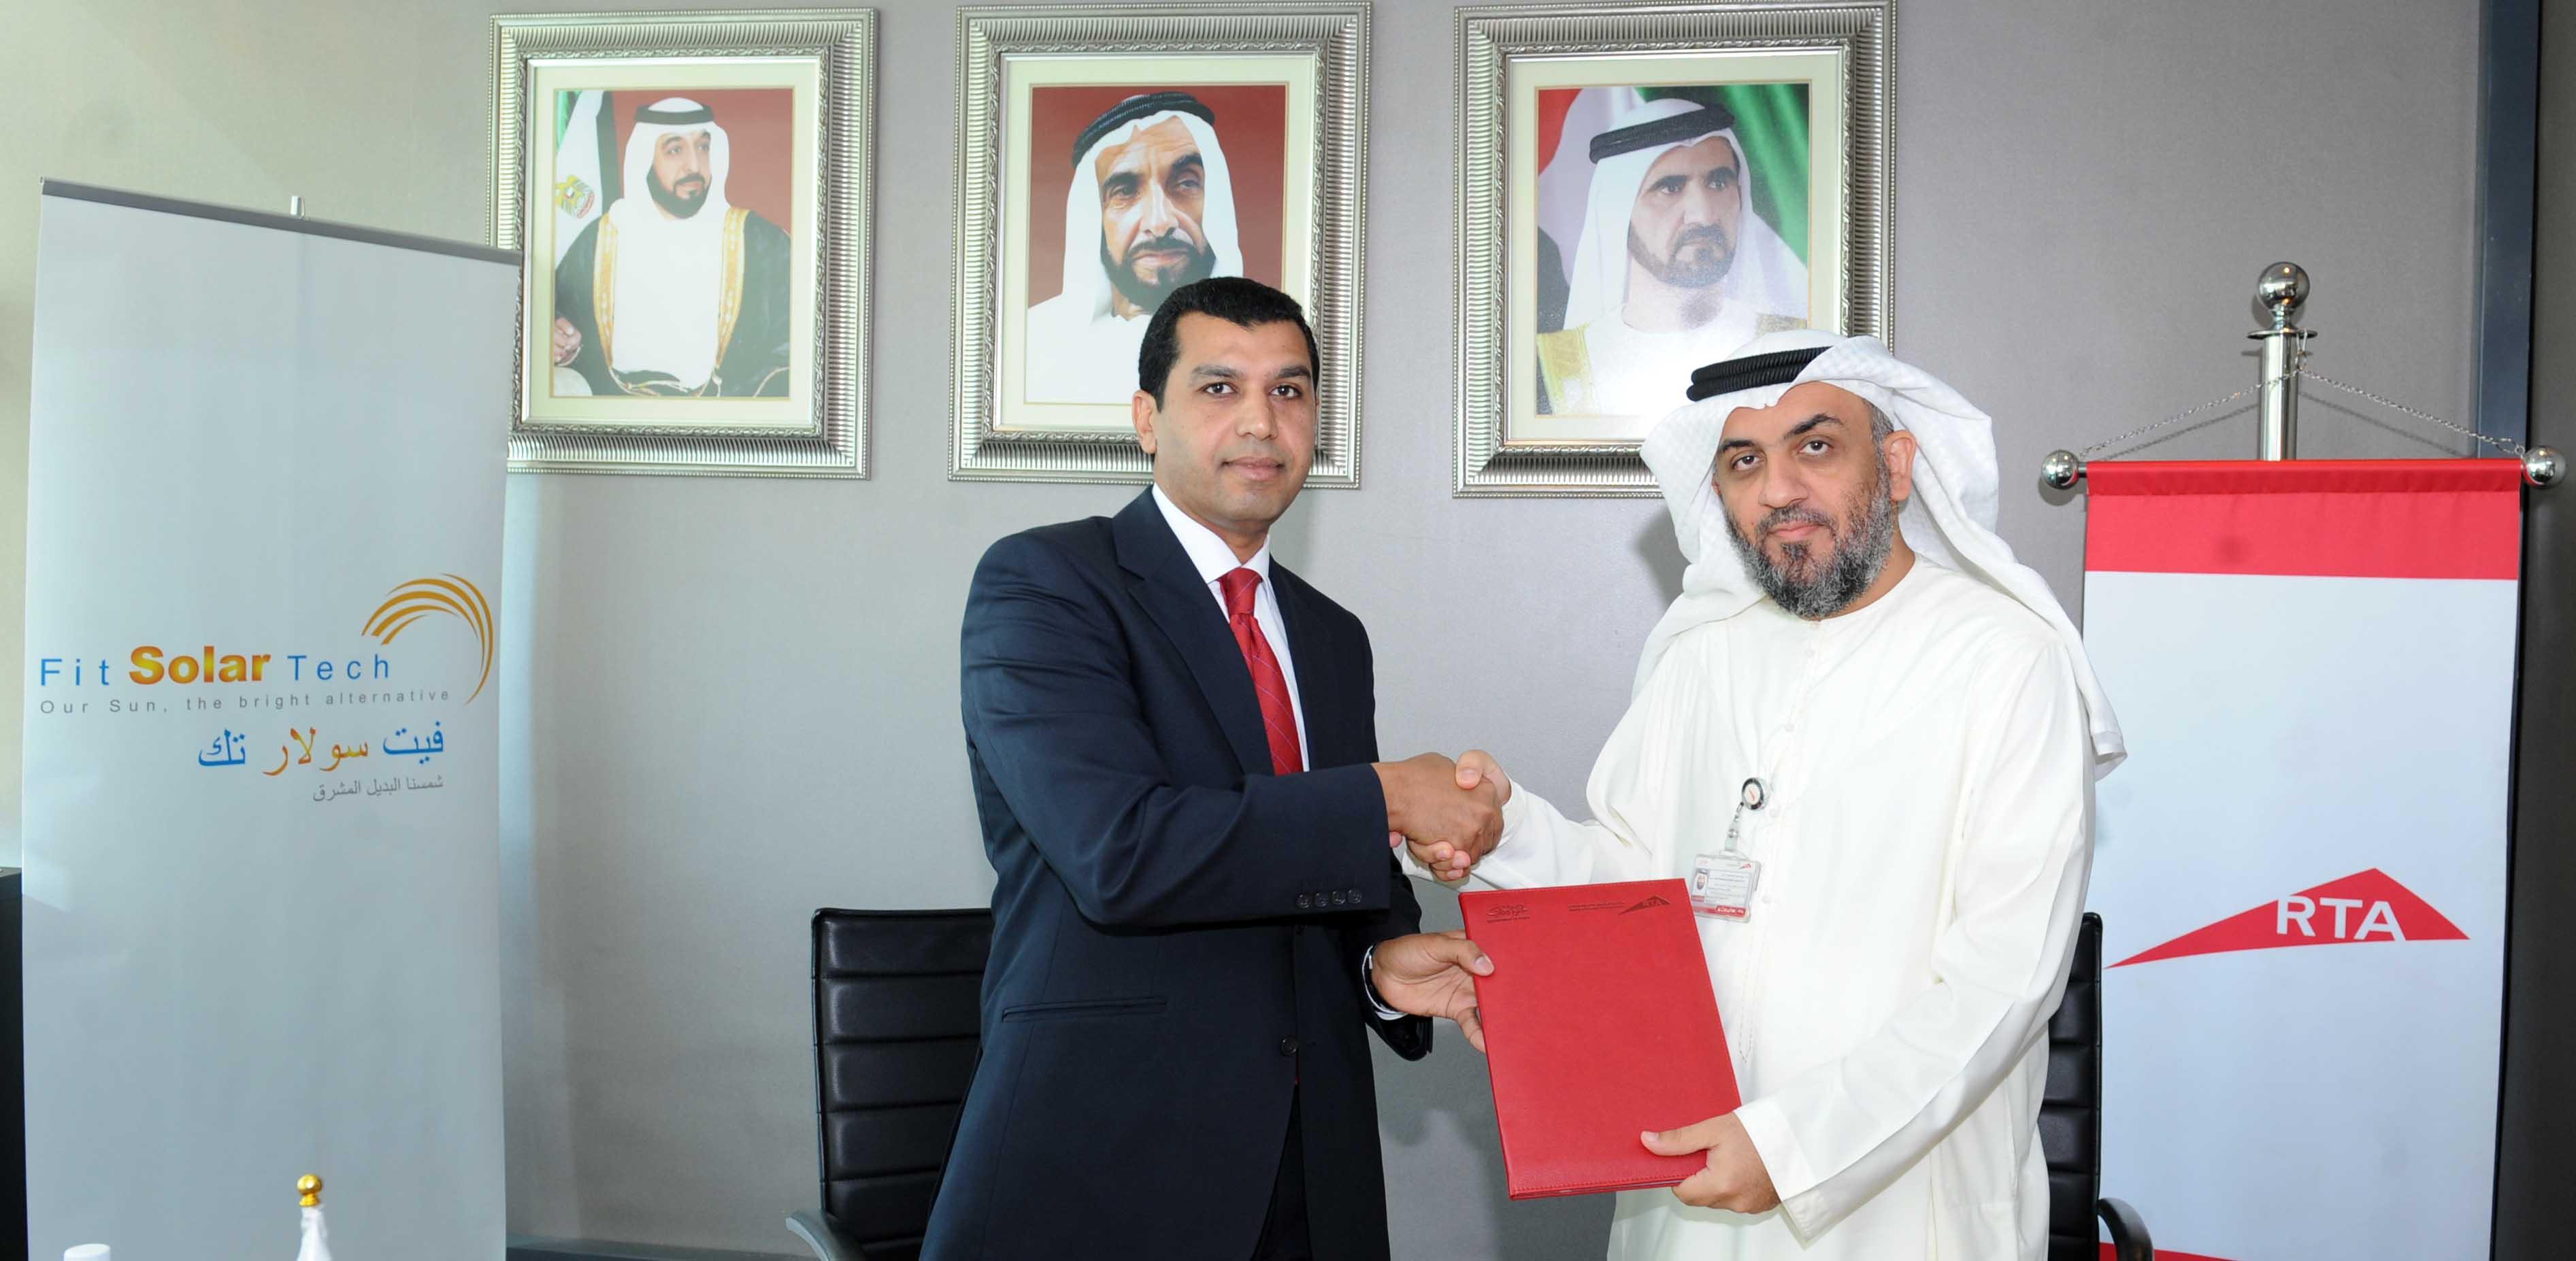 SLA agreement Signture